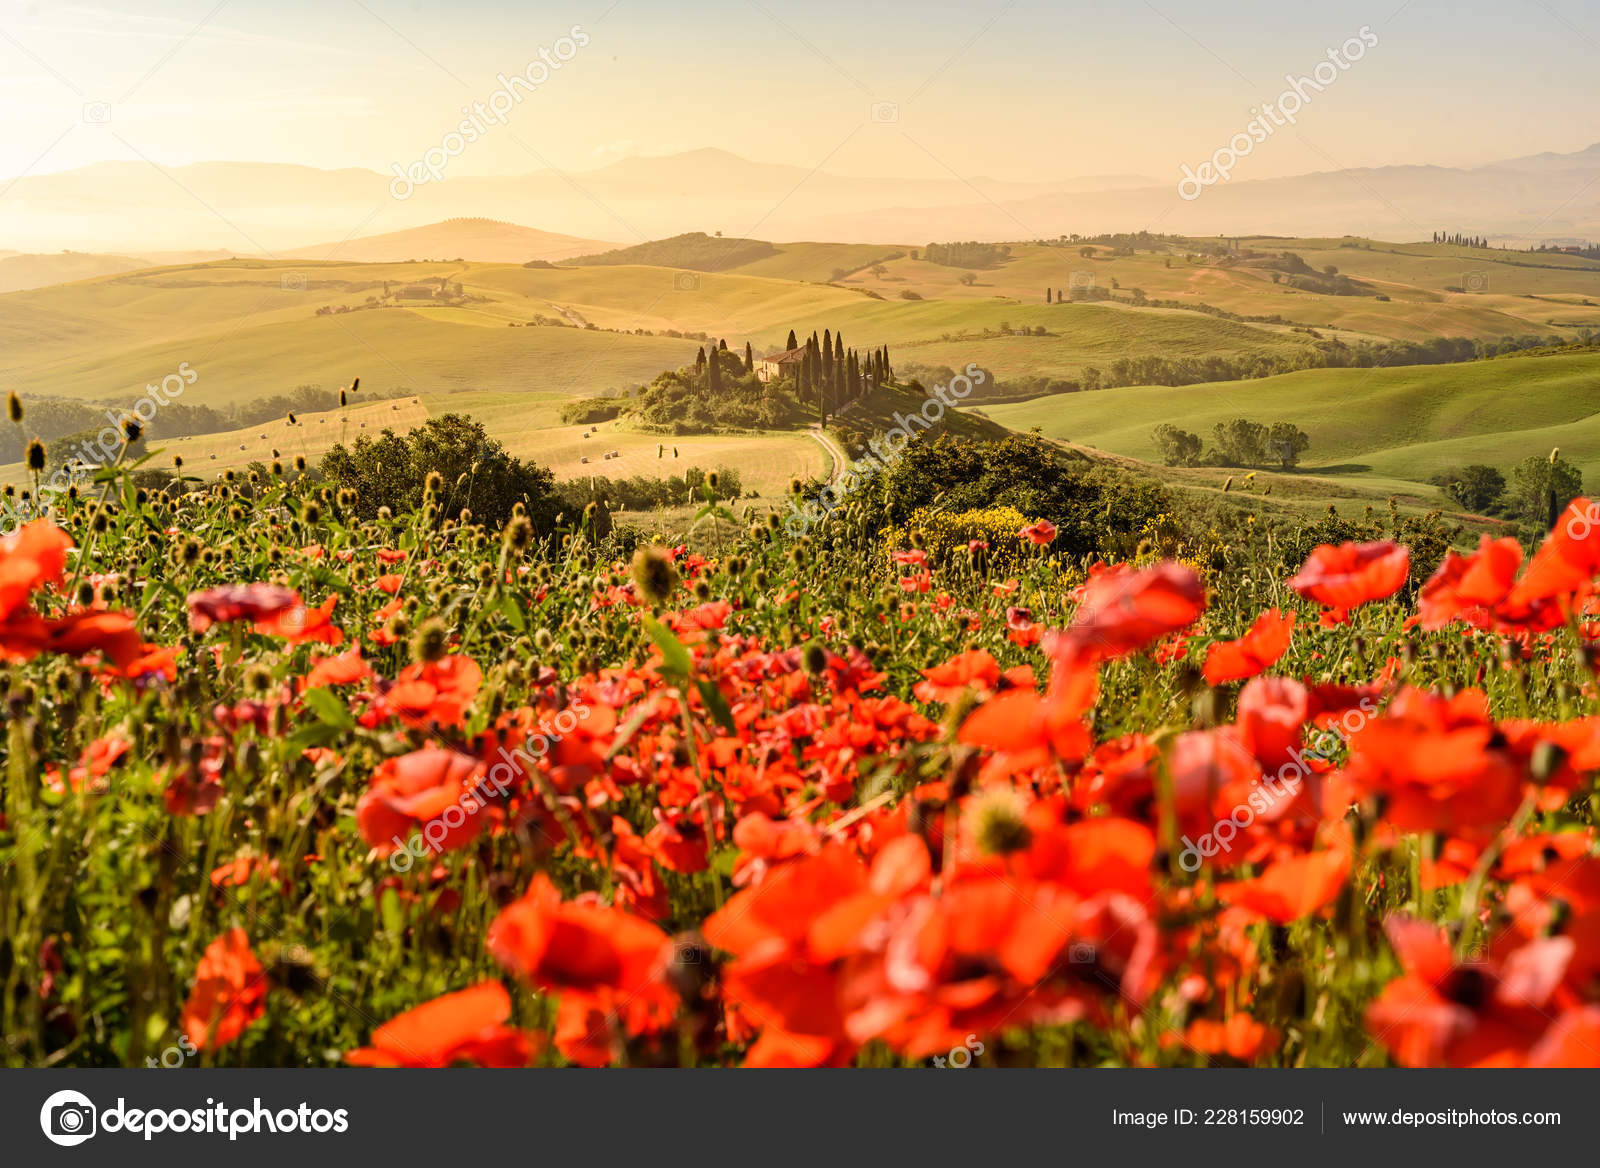 Poppy Flower Field Beautiful Landscape Scenery Tuscany Italy